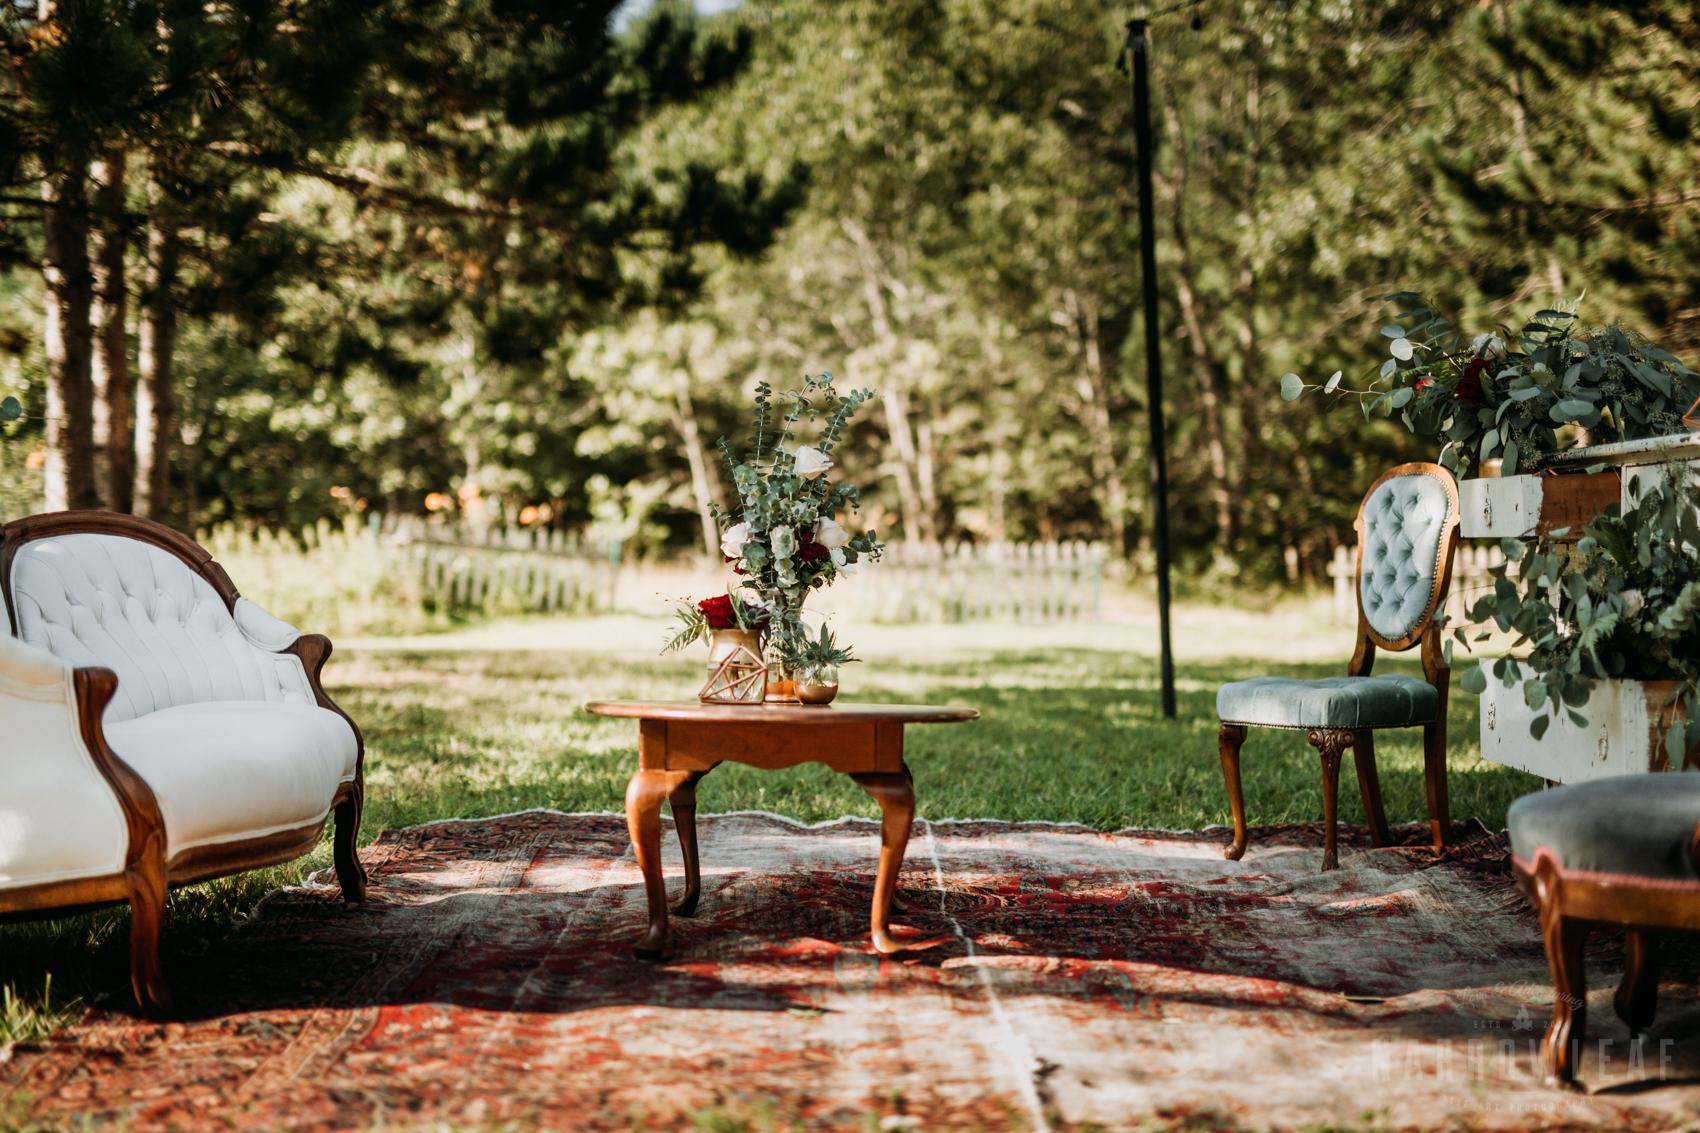 Summer-boho-wedding-details-burlap-and-bells-wi-NarrowLeaf_Love_&_Adventure_Photography-8.jpg